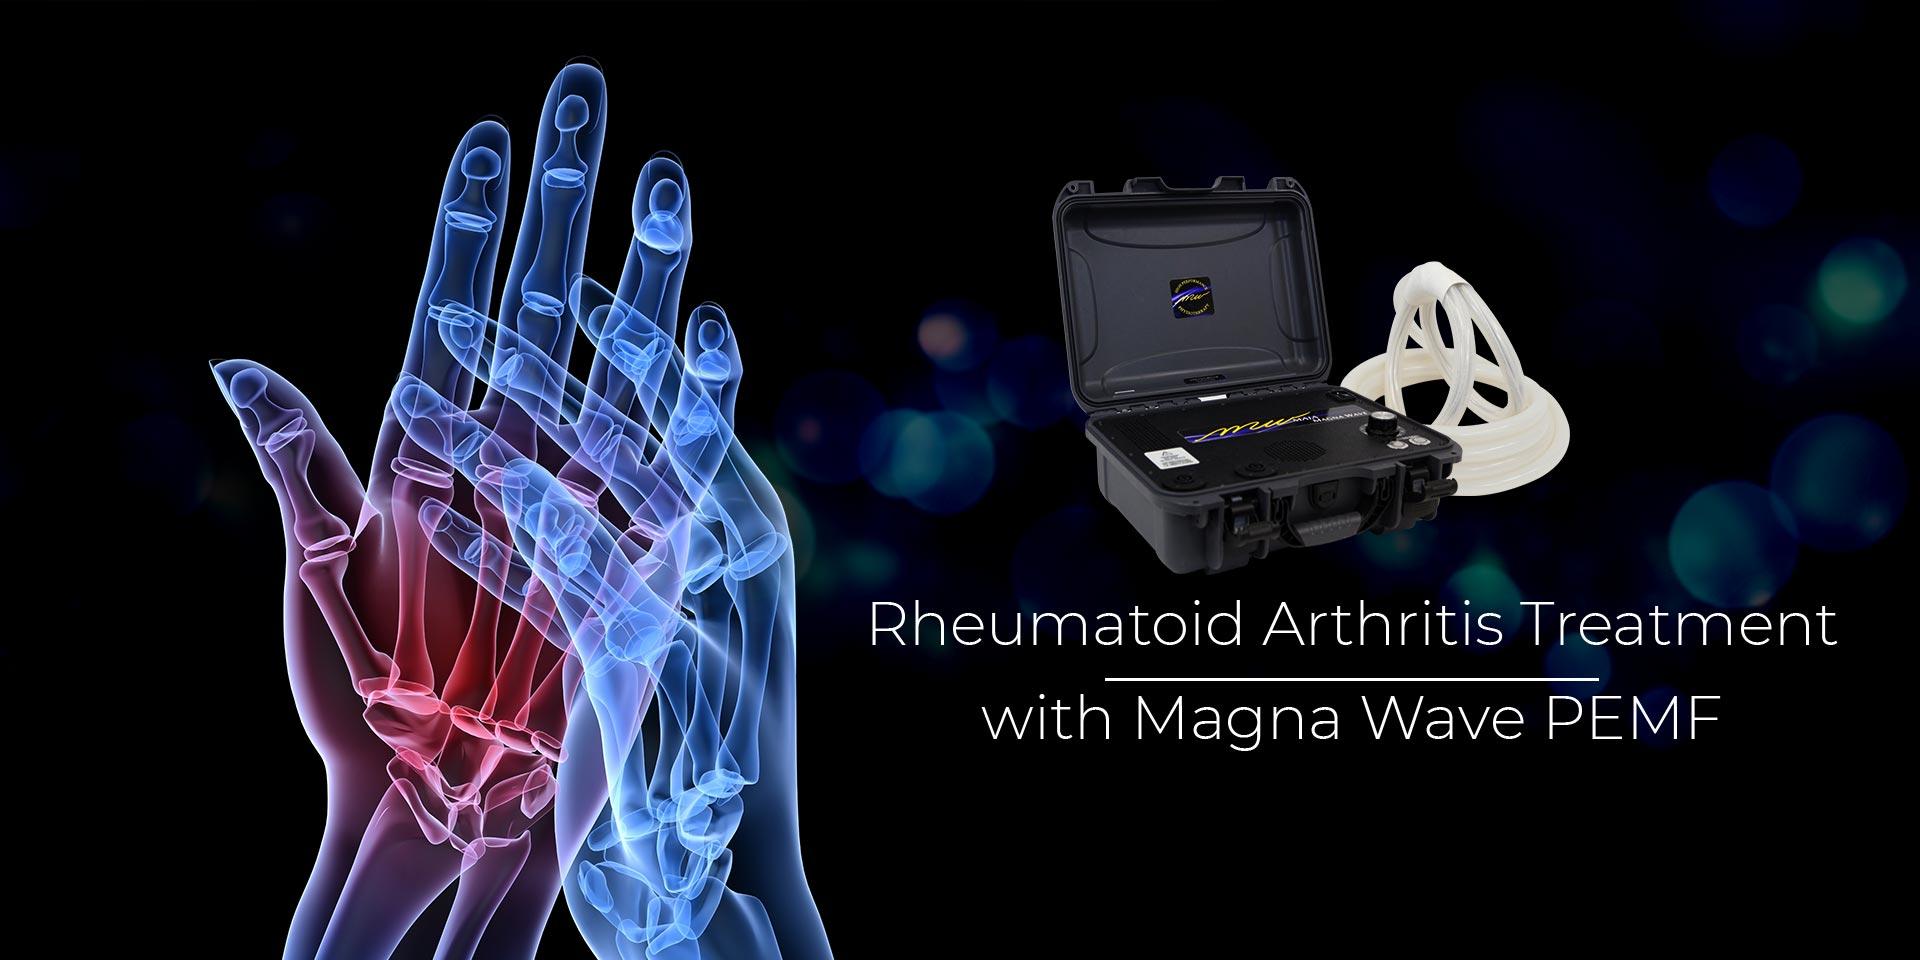 Rheumatoid Arthritis Treatment with Magna Wave PEMF